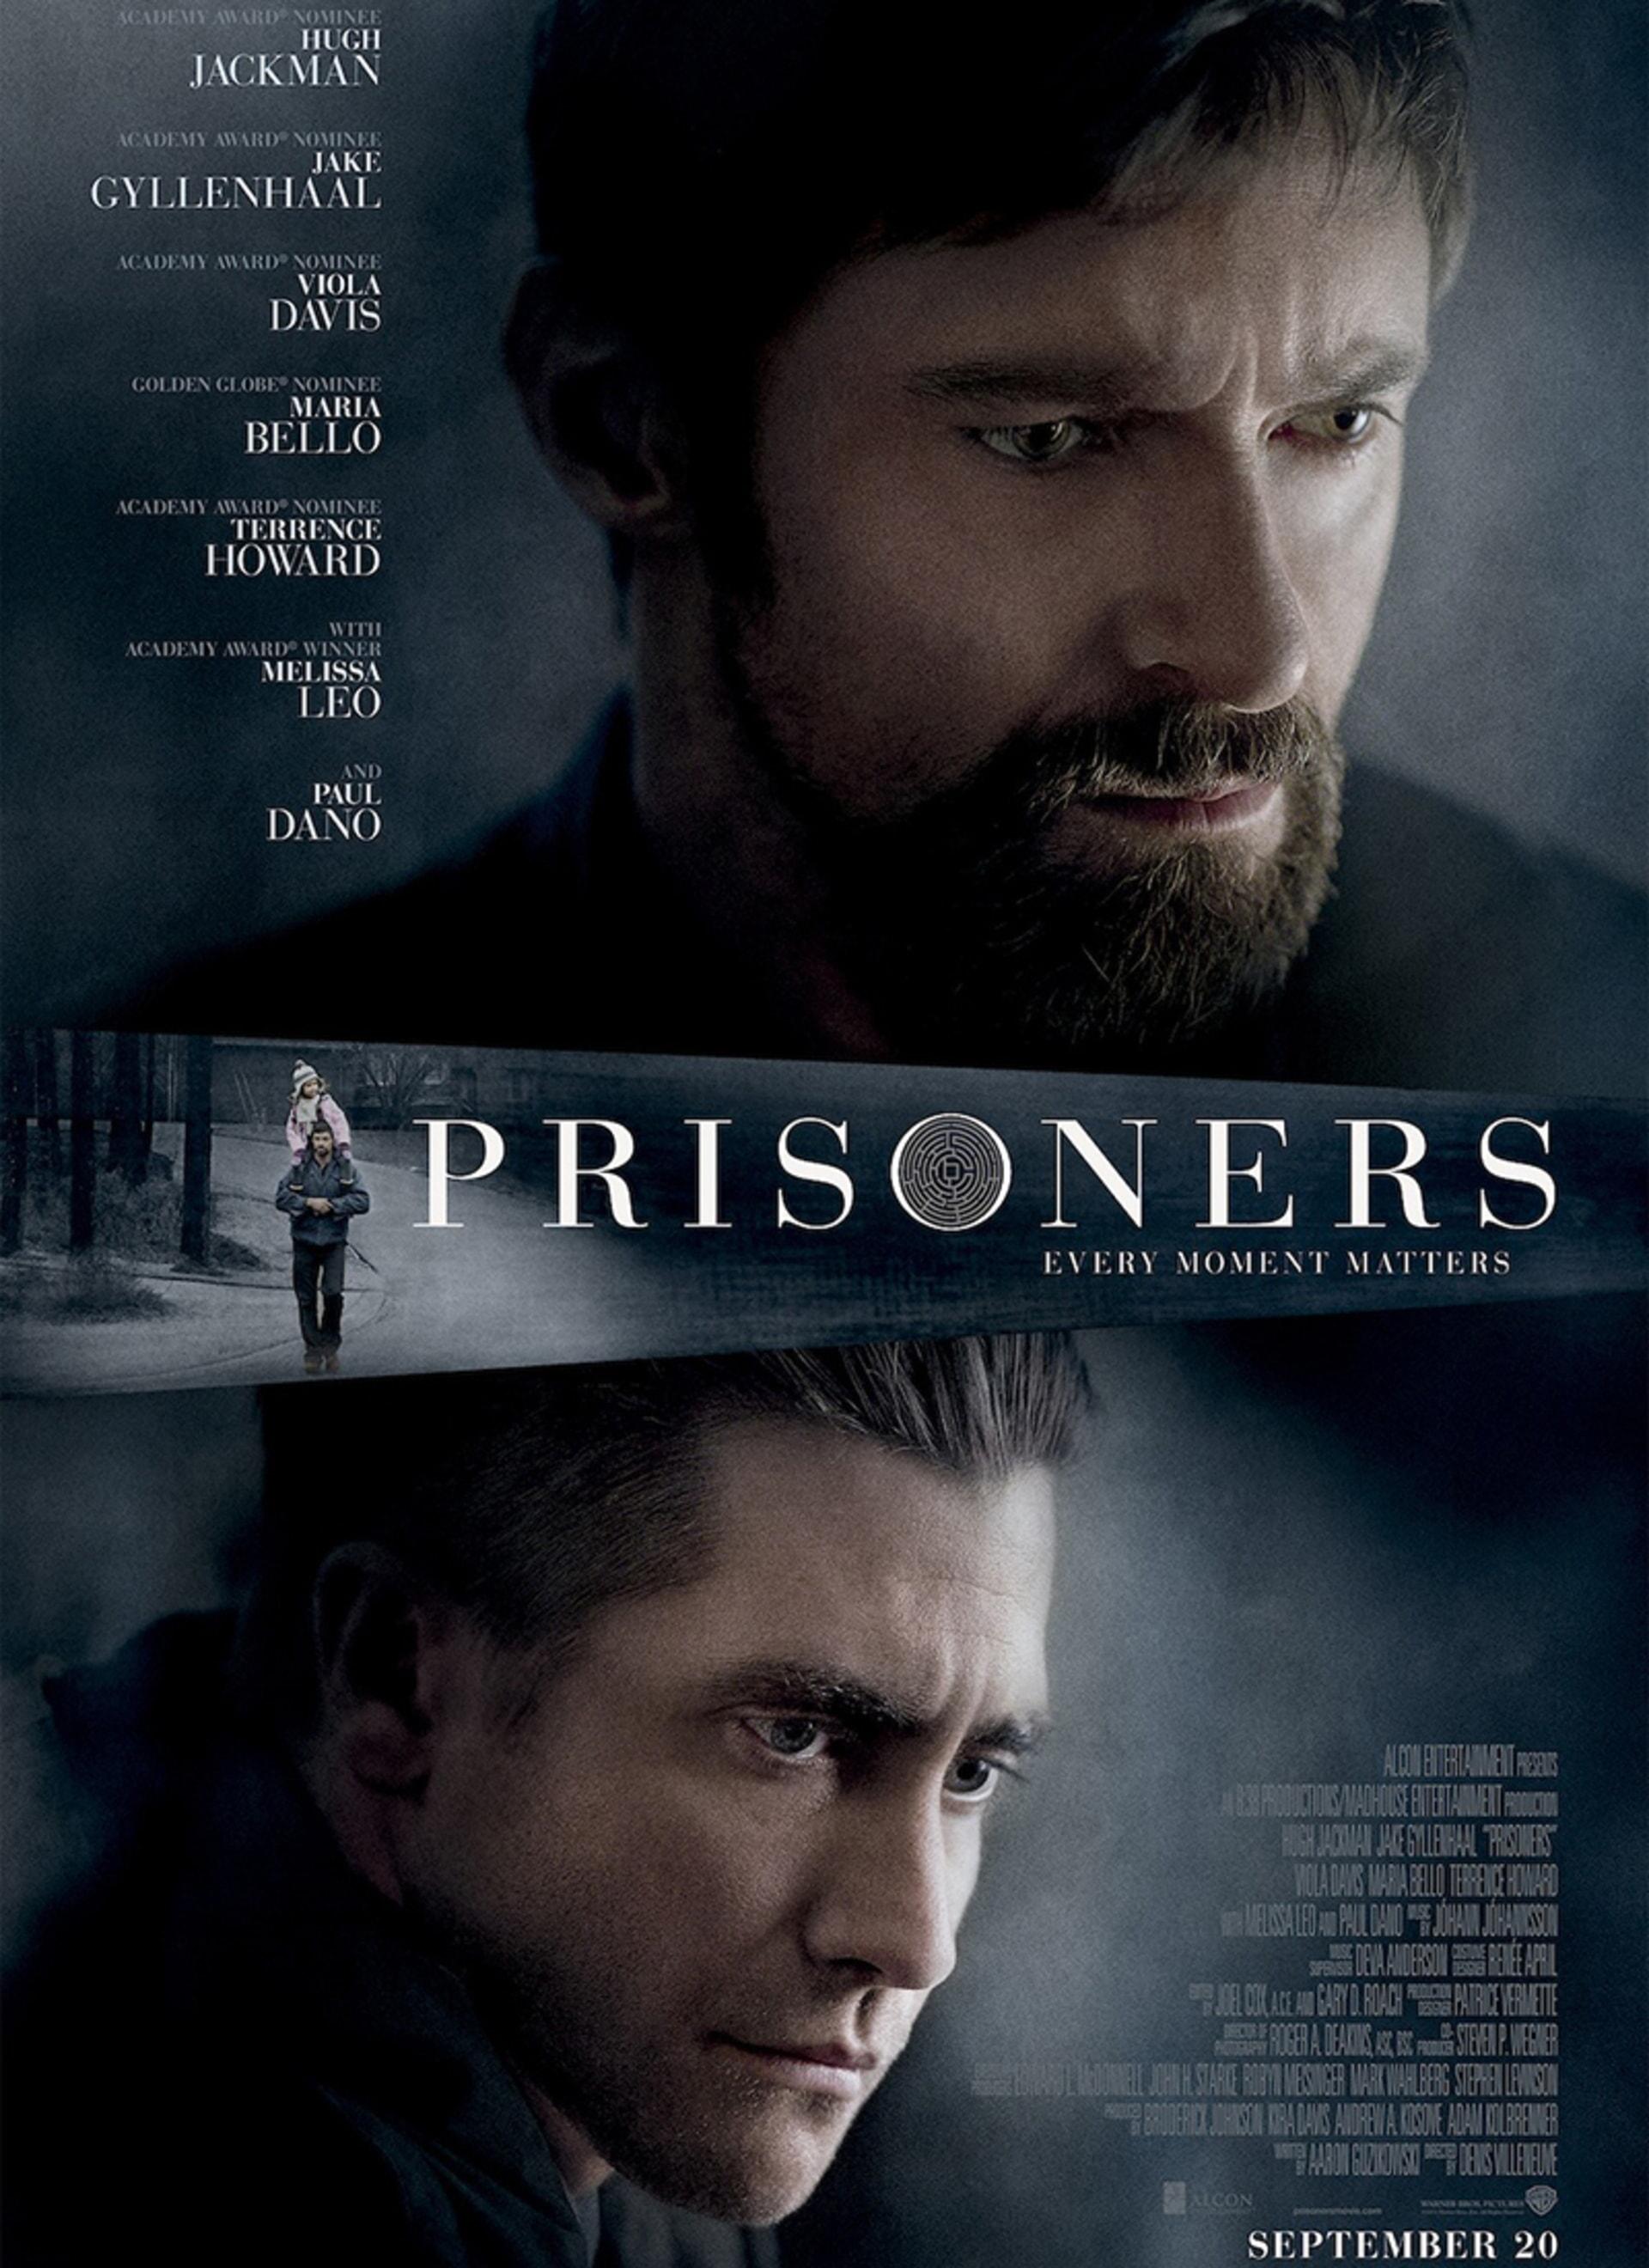 Prisoners - Poster 1